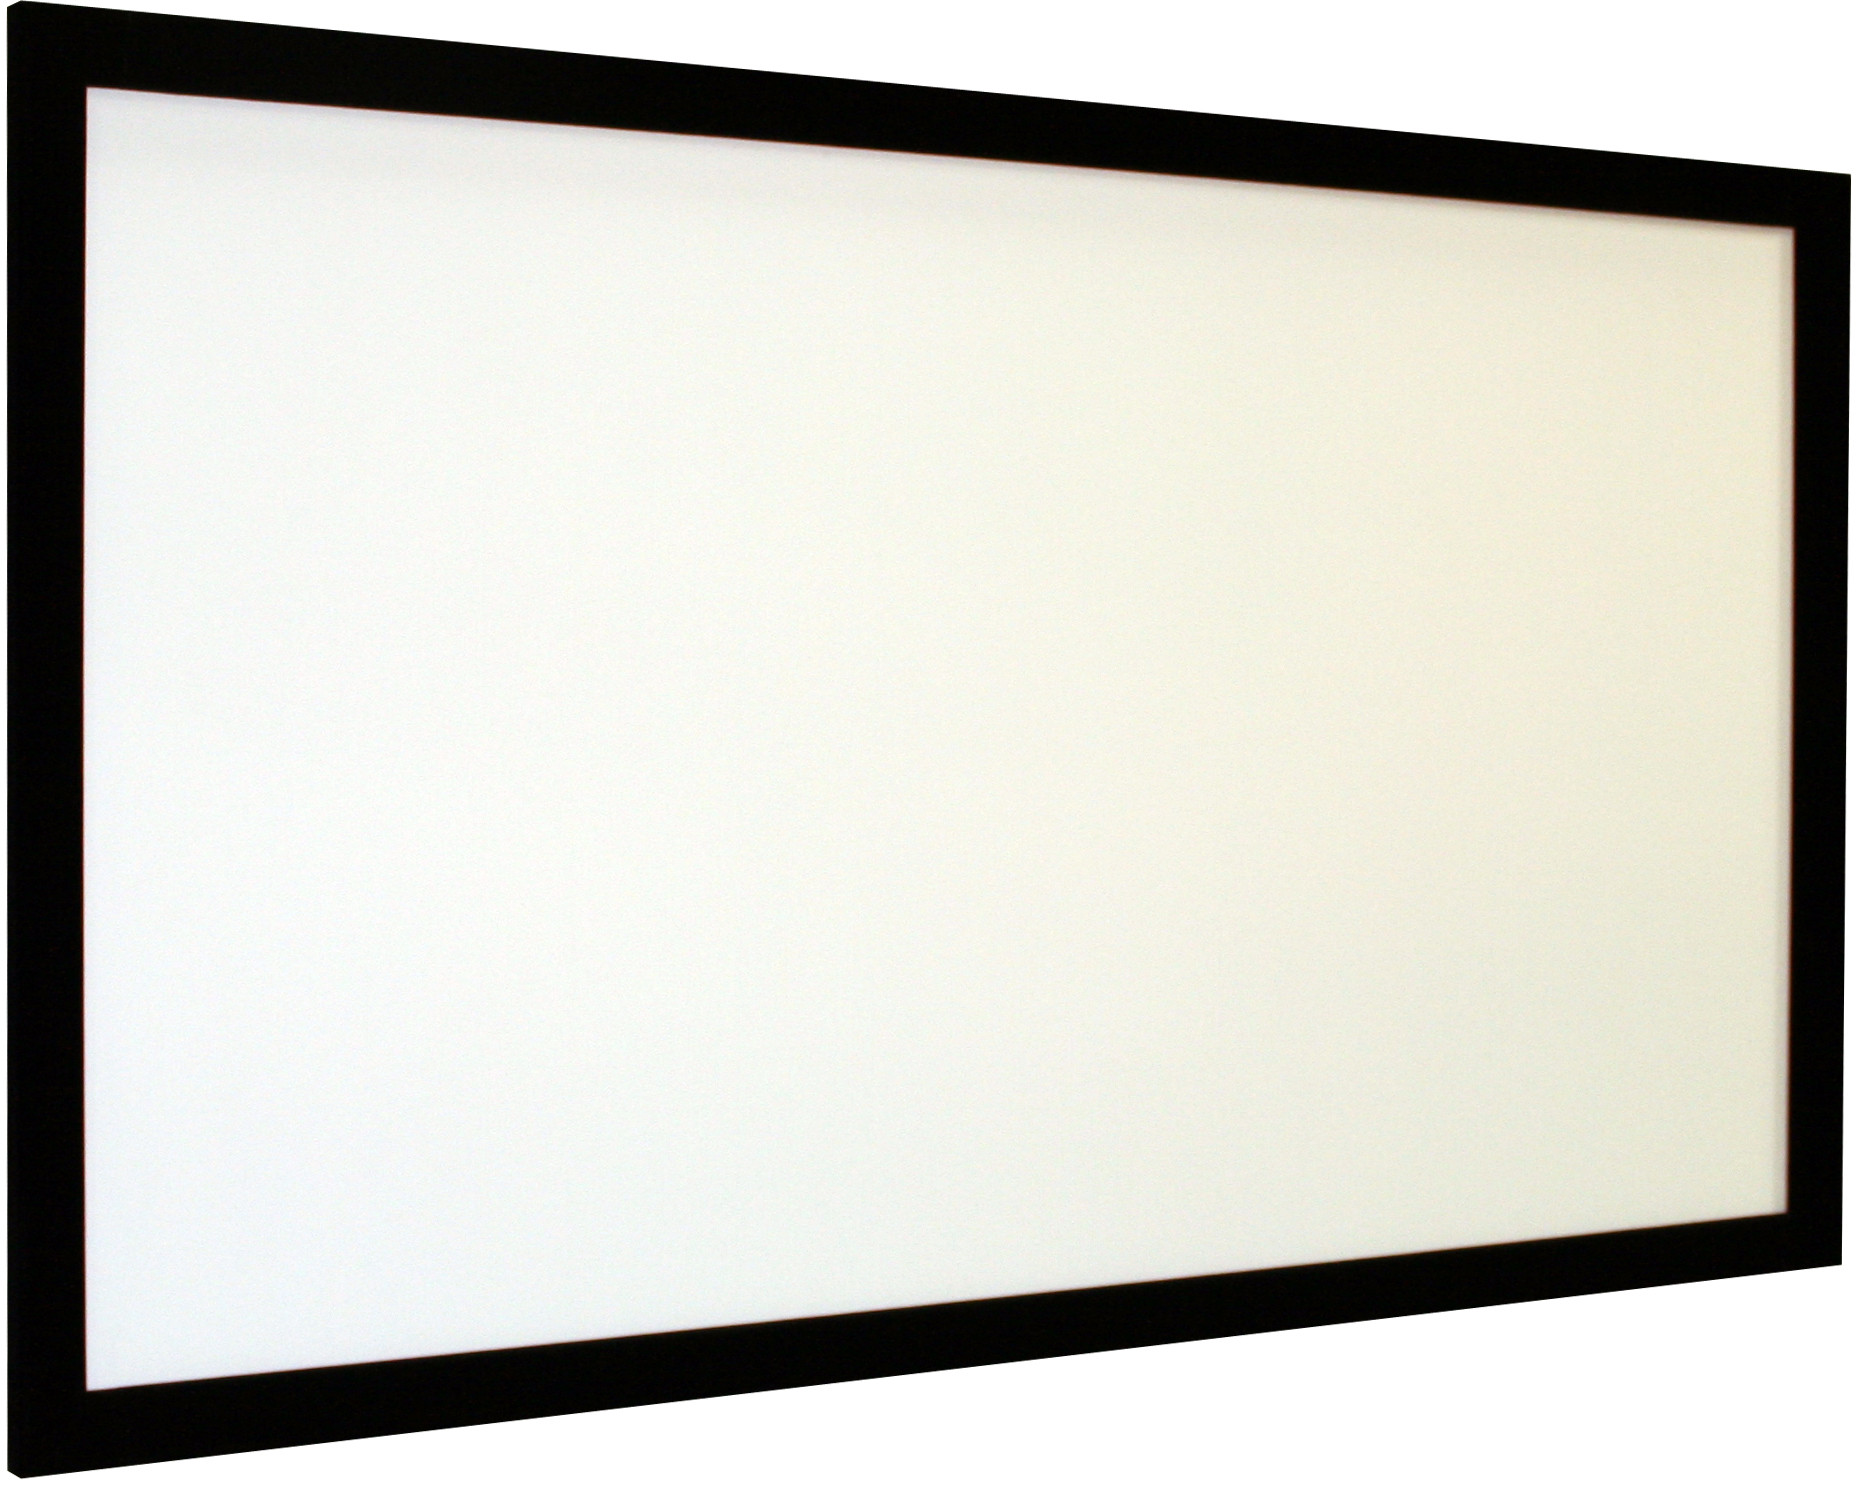 Vision Light 210 x 131 cm data format og Veltex ramme